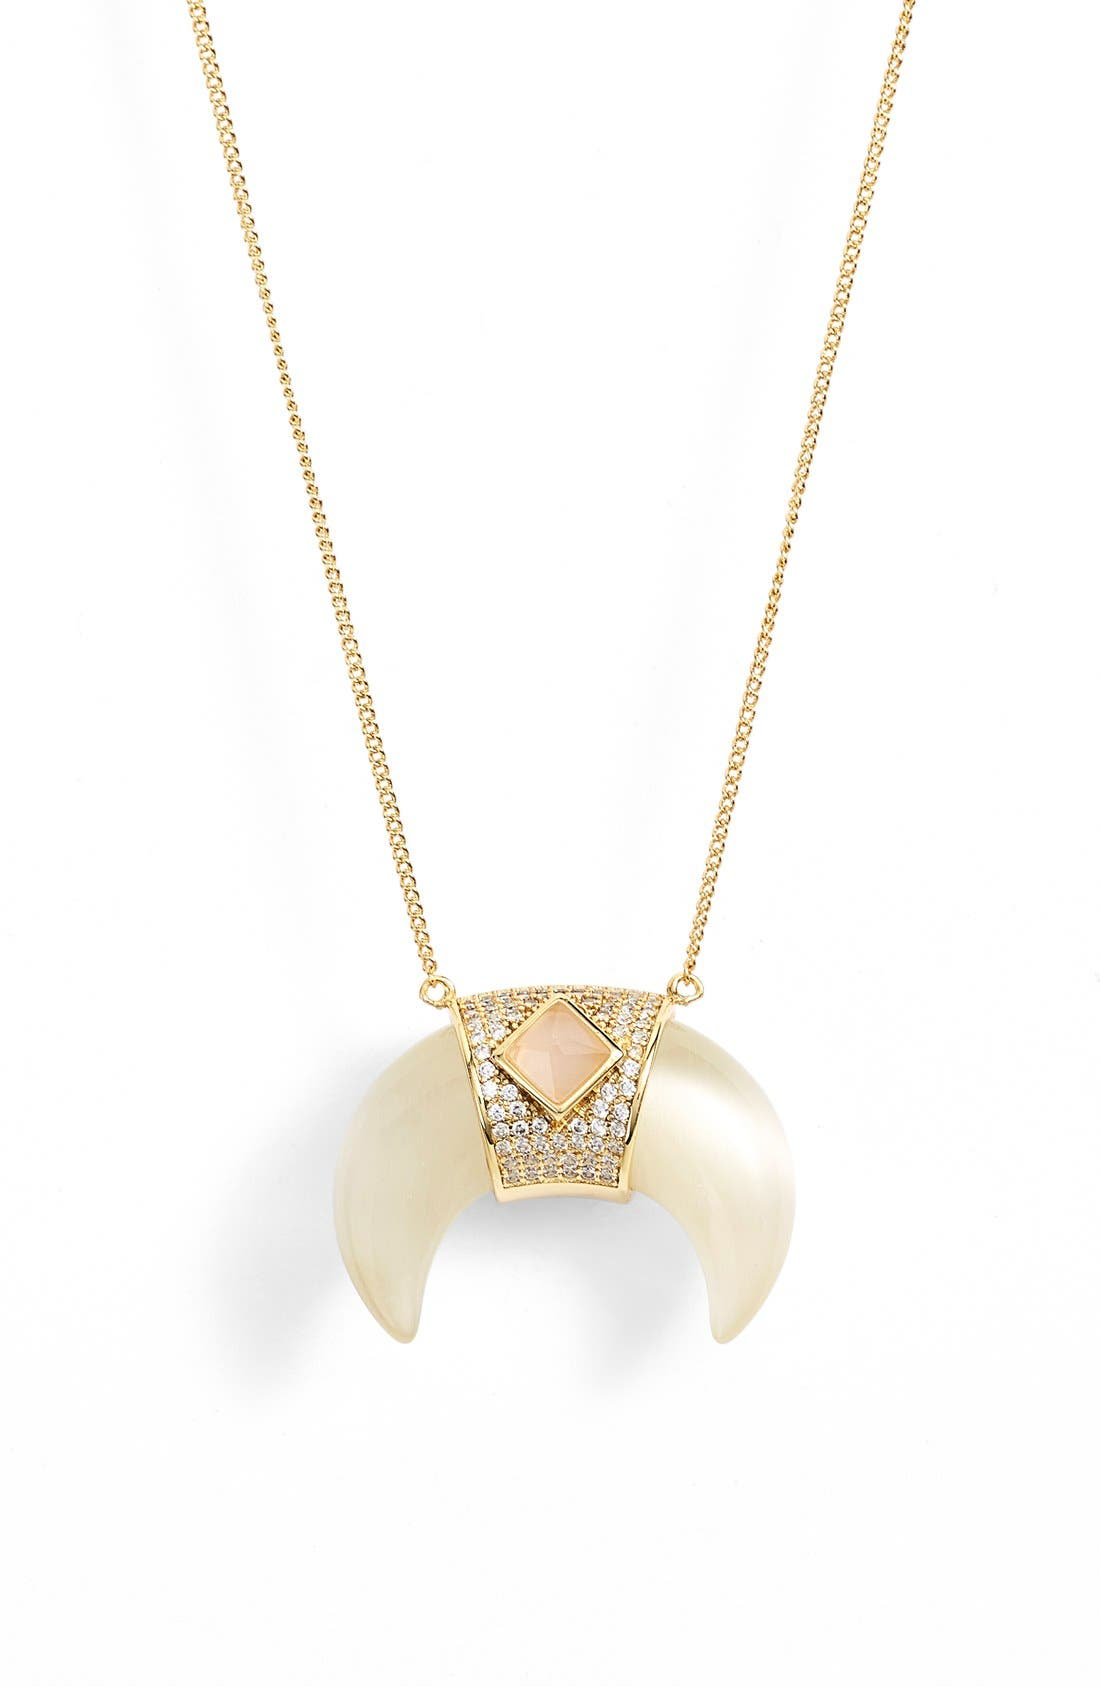 Main Image - Melanie AuldPavé Tusk Pendant Necklace